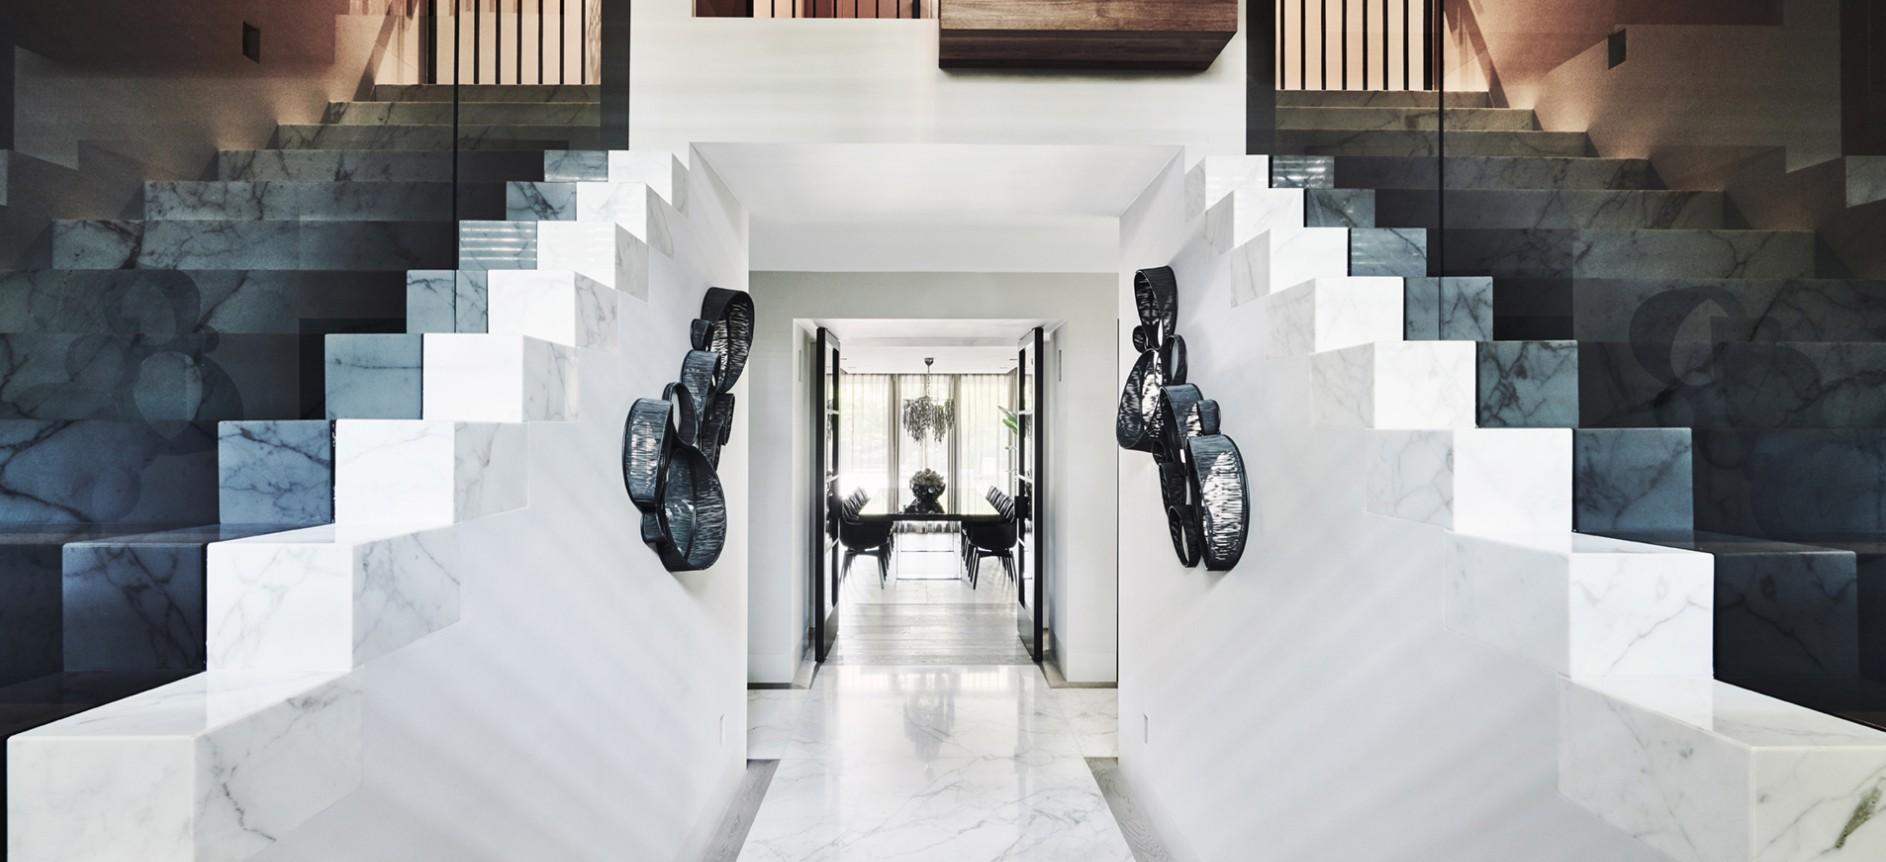 Dami Luxury Interior Linkedin,Living Room Fall Decorations Home